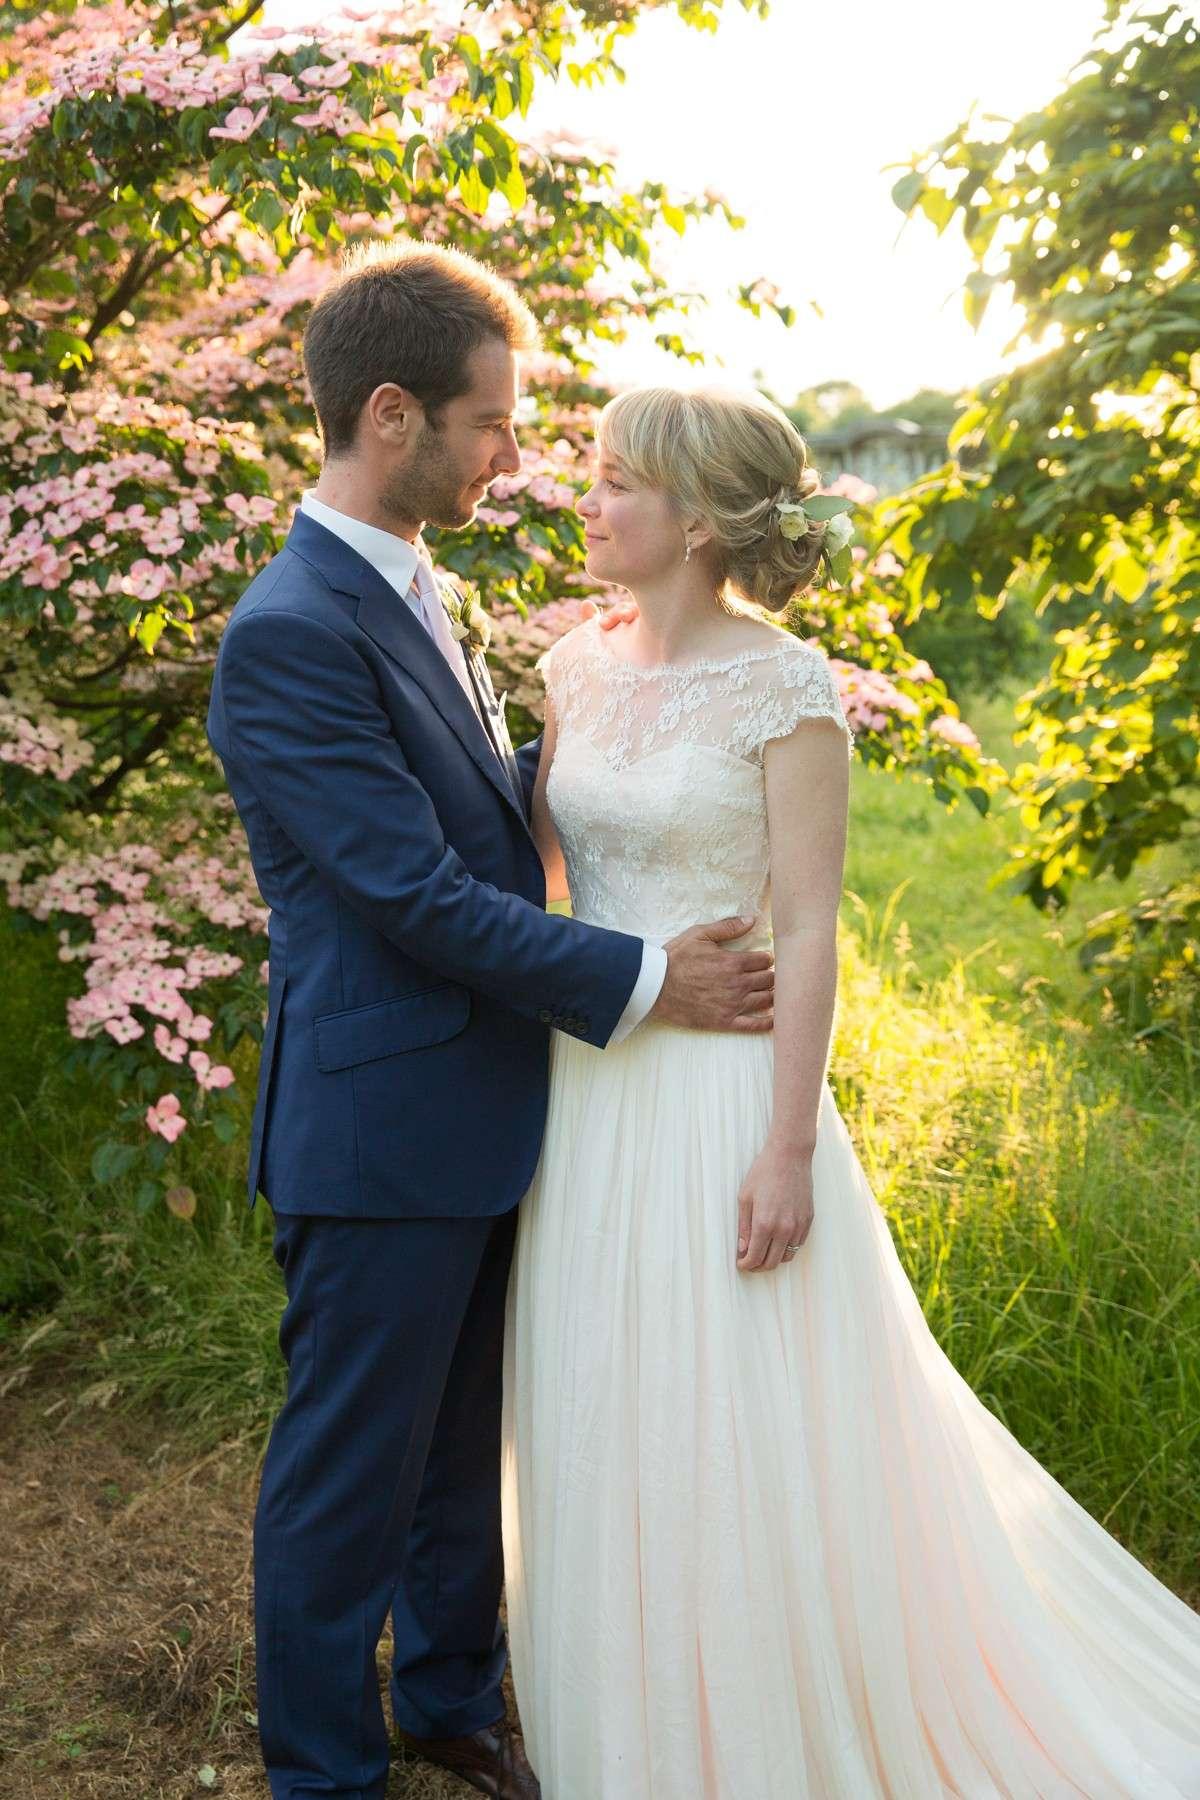 wedding couple at National Trust wedding